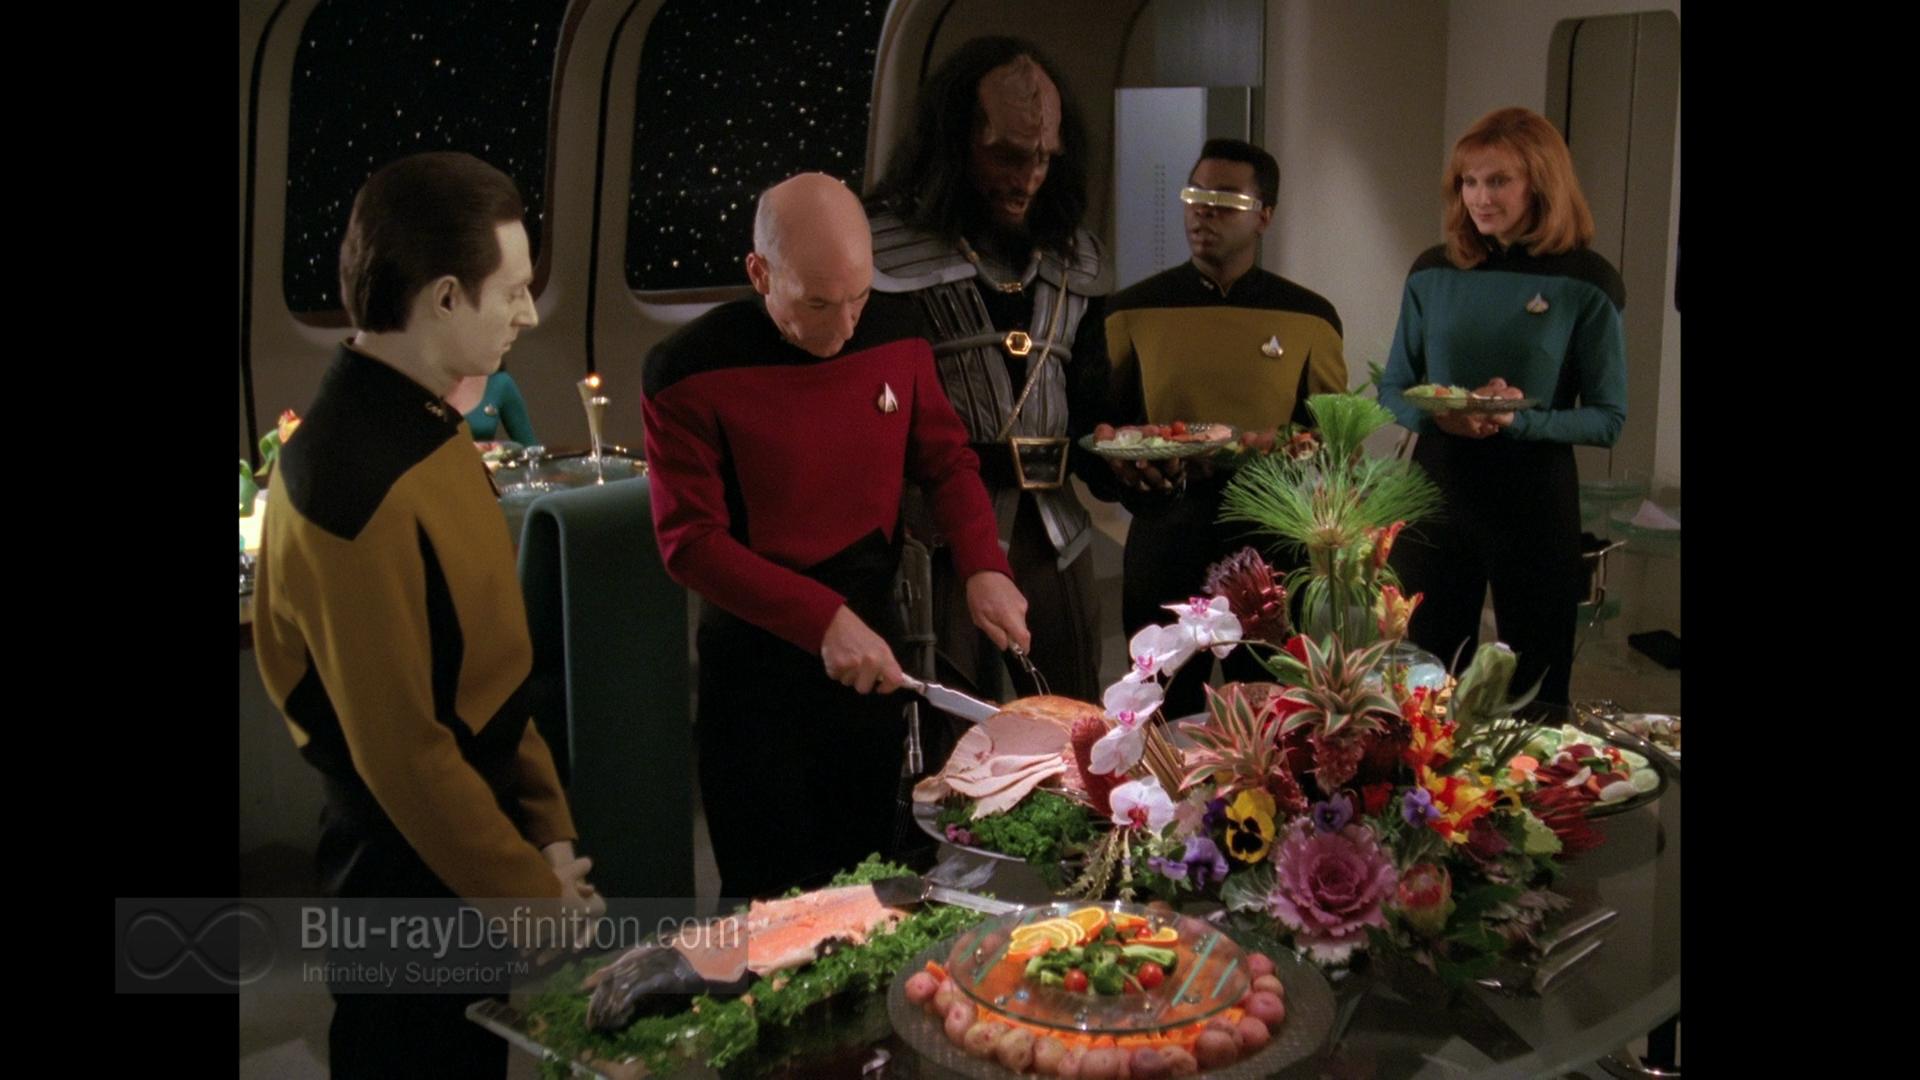 Sins of the Father - Blu-ray - bridge crew - Star Trek TNG